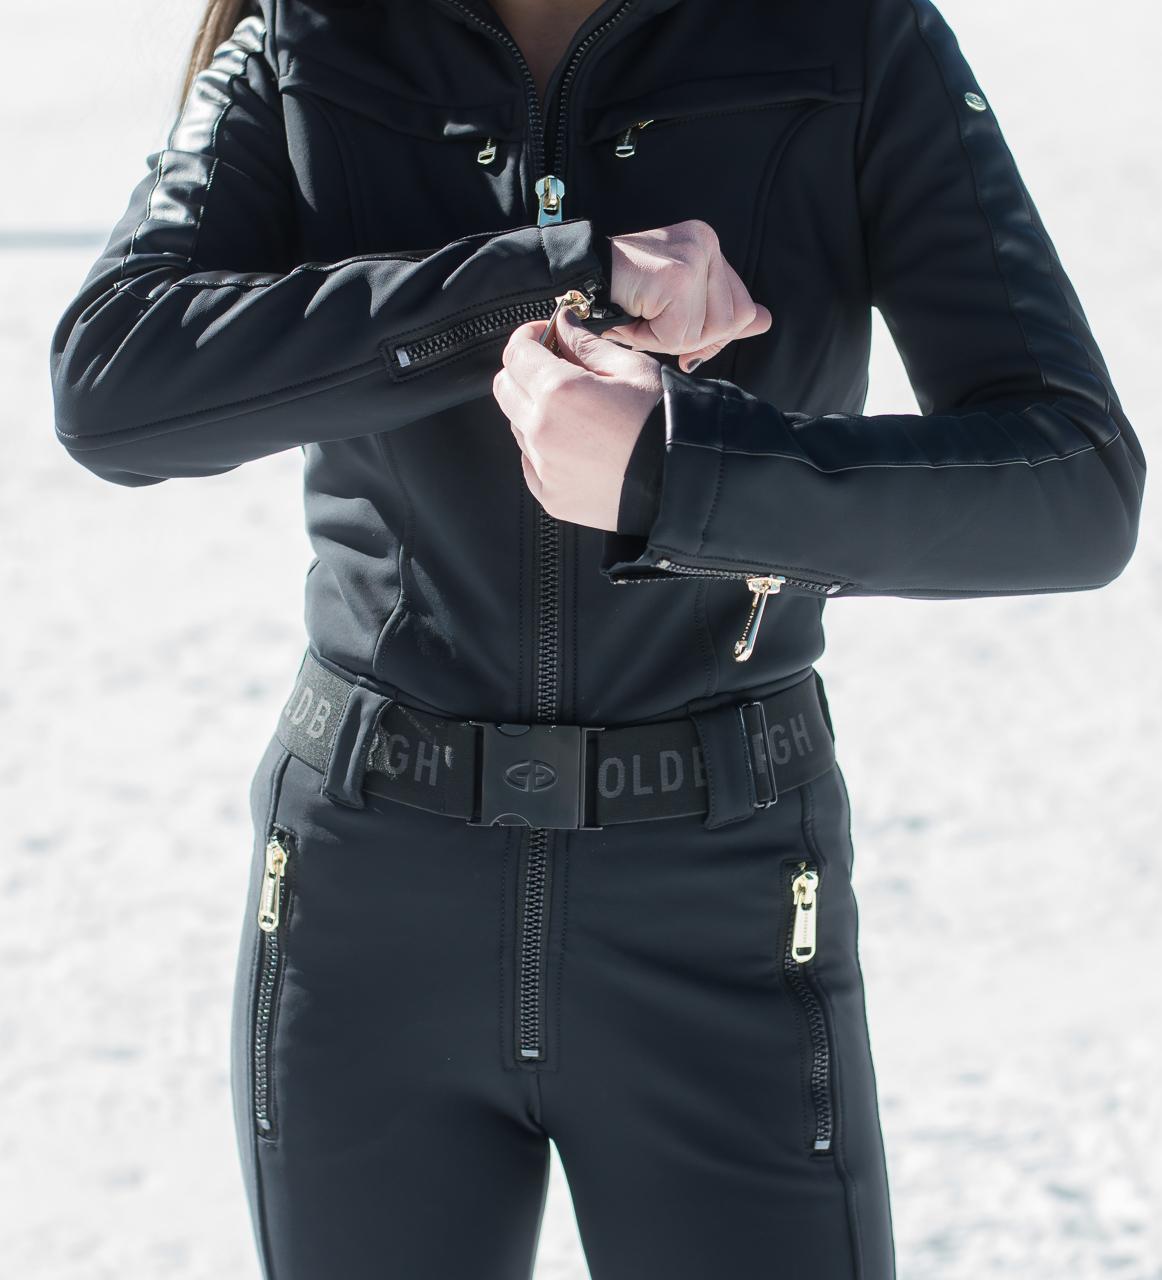 Tight Black Ski Suit